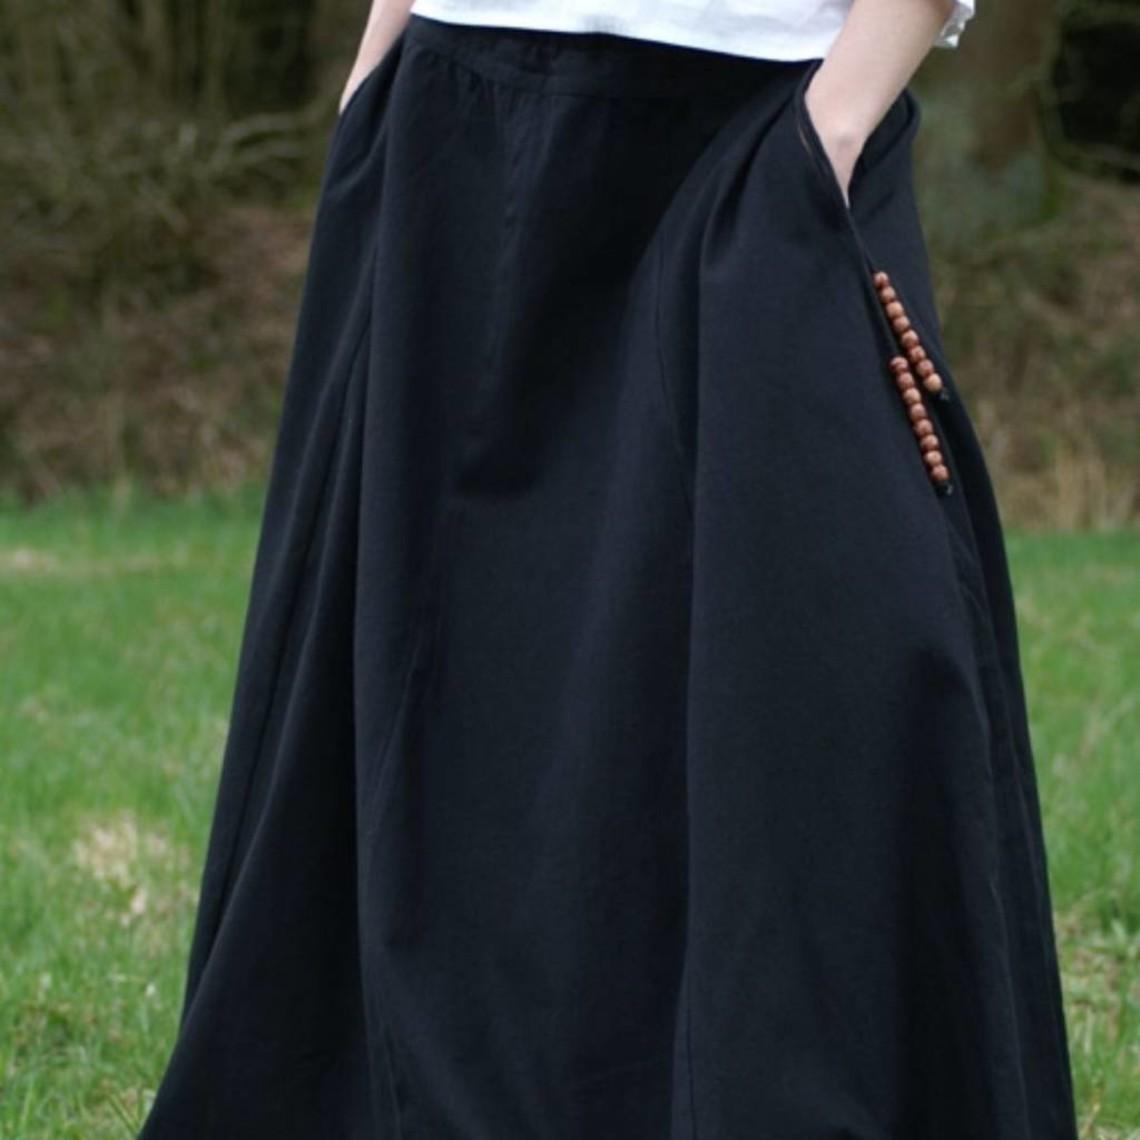 Falda medieval de melisende, negra.